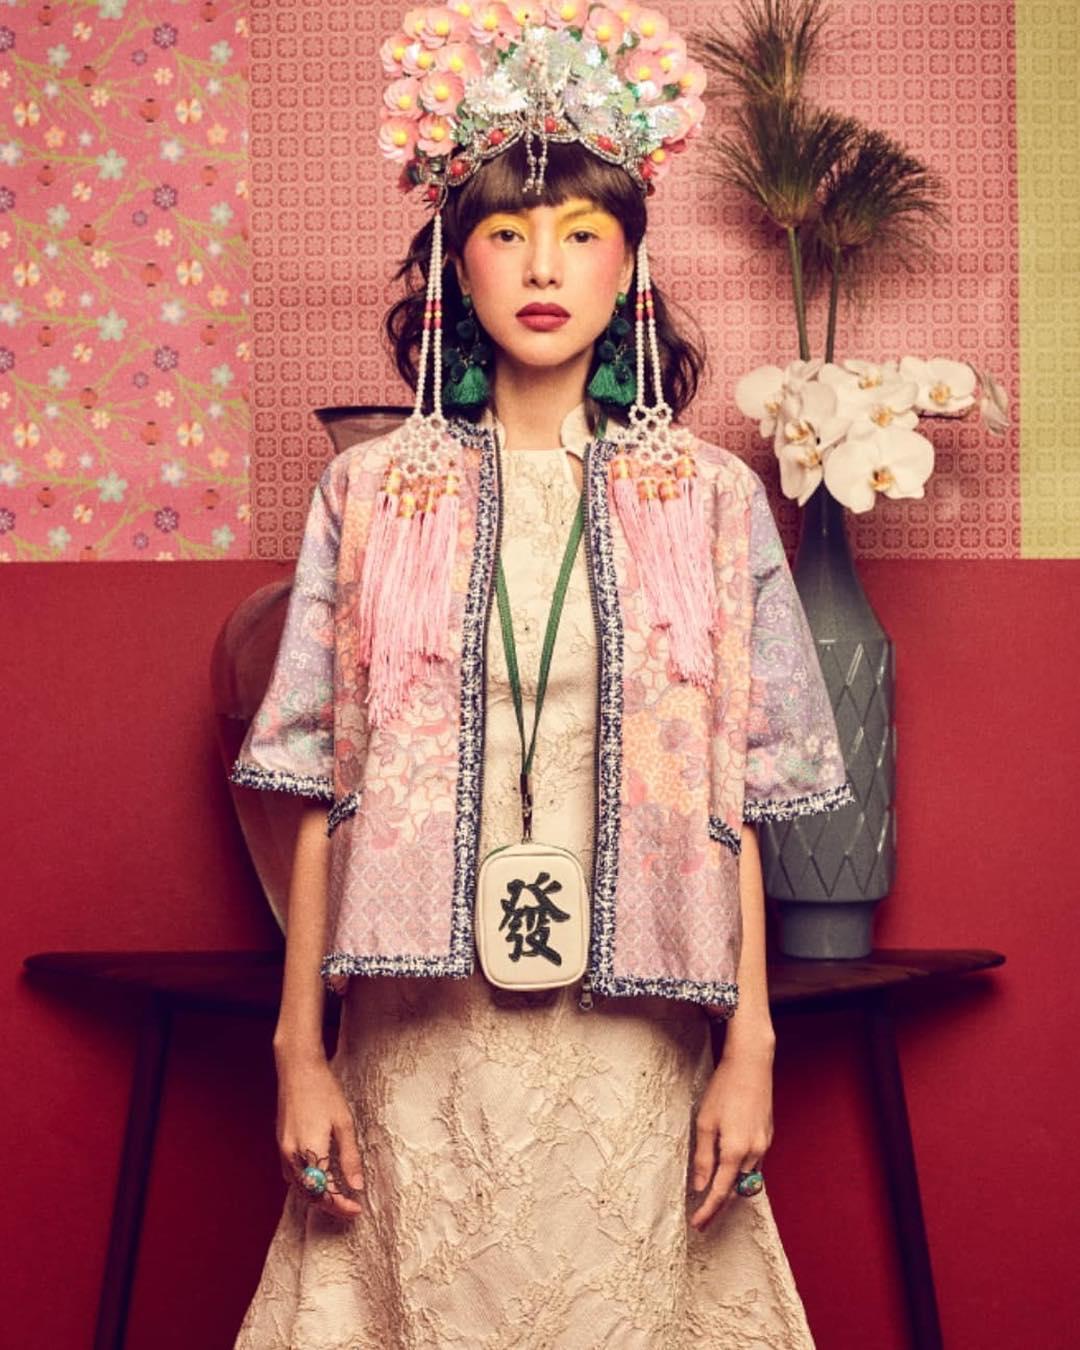 Dari Bintang Sinetron Sampai Istri Bangsawan, Ini Dia 10 Artis Tercantik Asal Malaysia